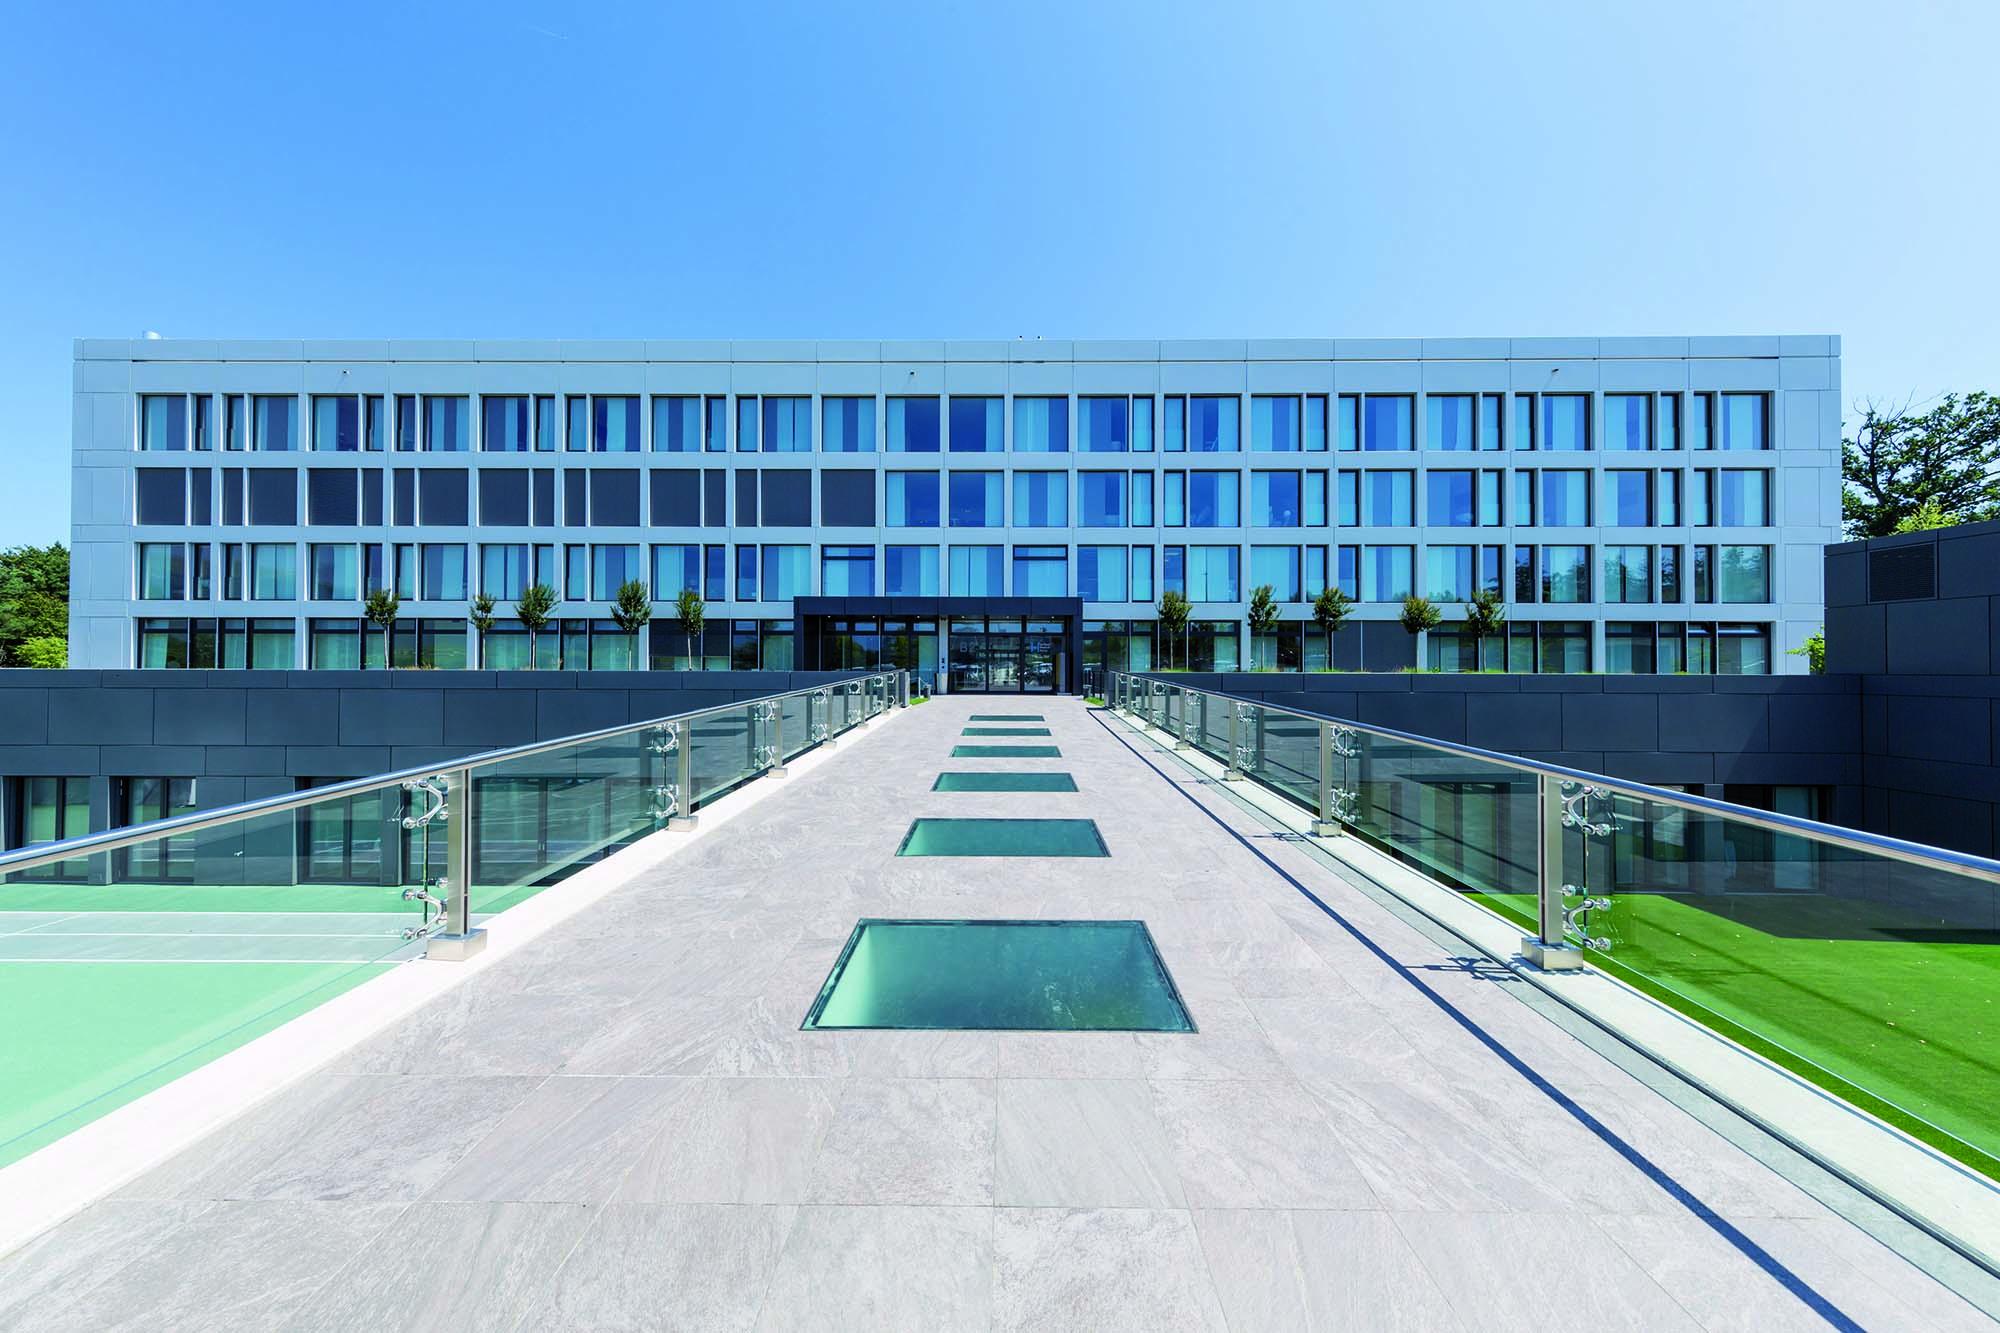 Hôpital de la Tour - Meyrin - Canton of Geneva - Switzerland